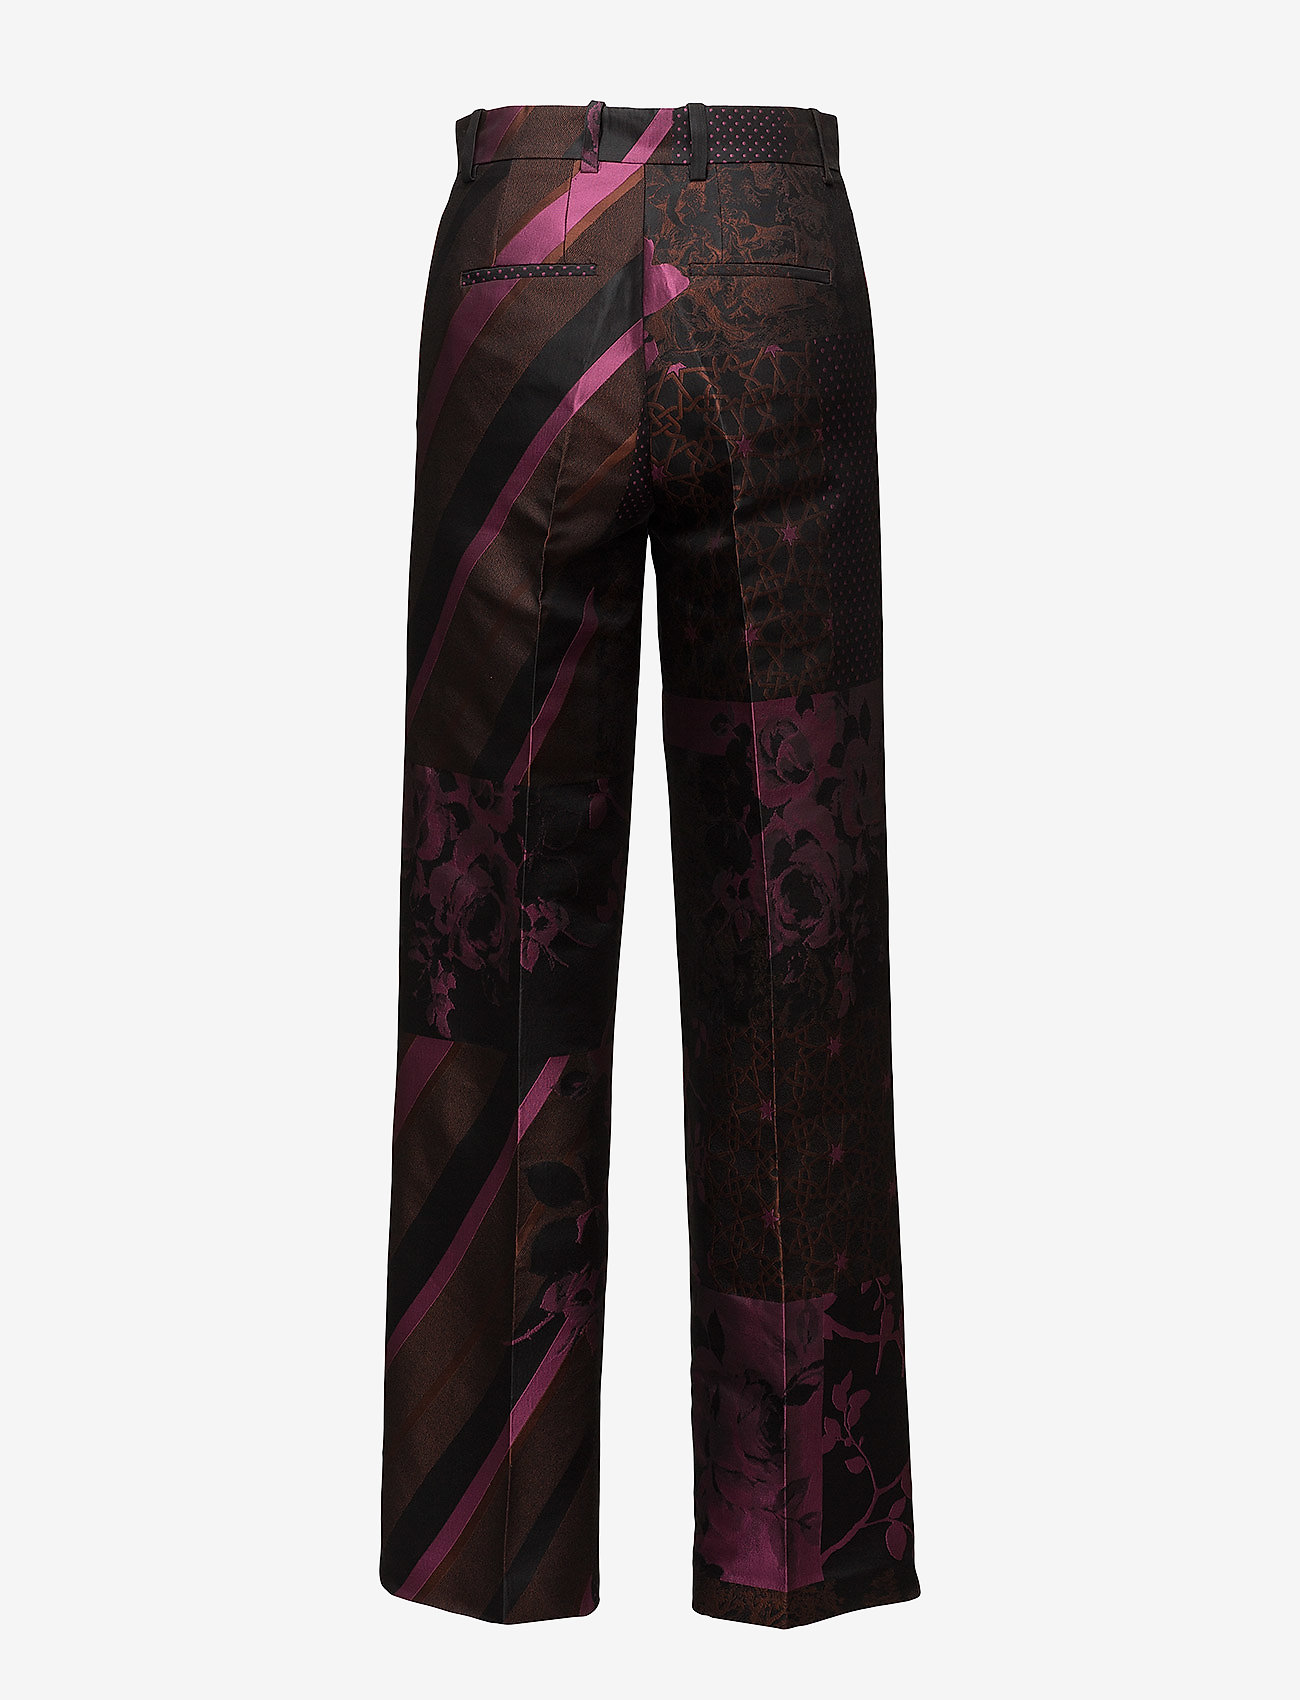 STINE GOYA - Sonia, 389 Collage Tailored - leveälahkeiset housut - collage rust